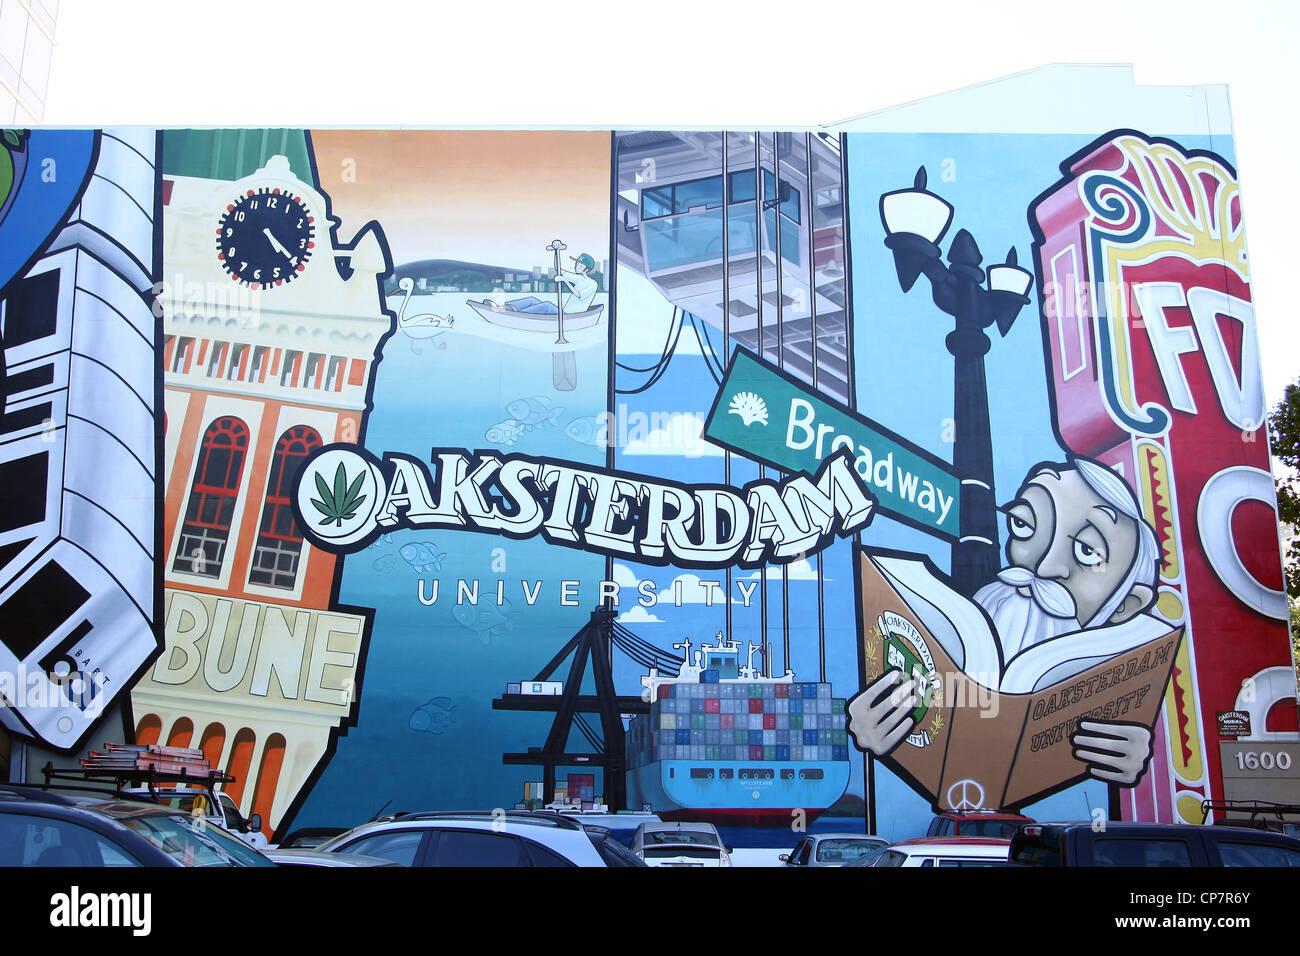 OAKSTERDAM UNIVERSITY CANNABIS UNIVERSITY MURAL 06 October 2011 - Stock Image